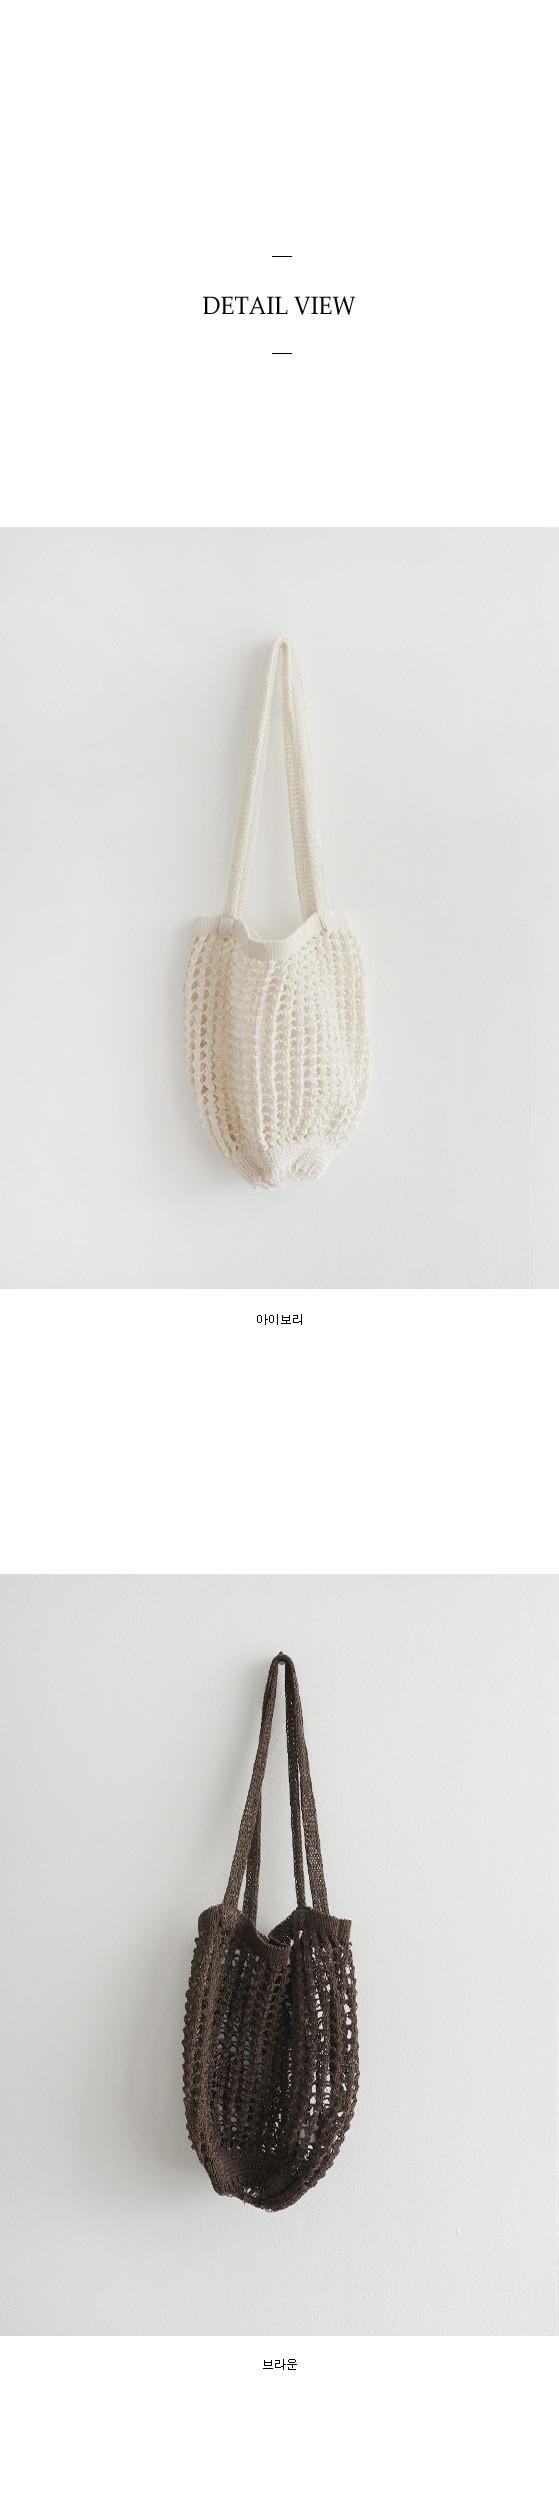 net knitting small bag